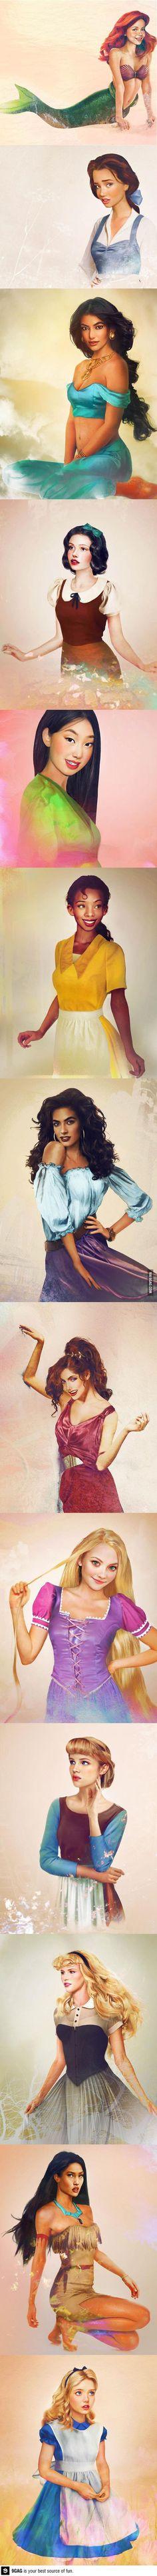 Real life Disney characters!